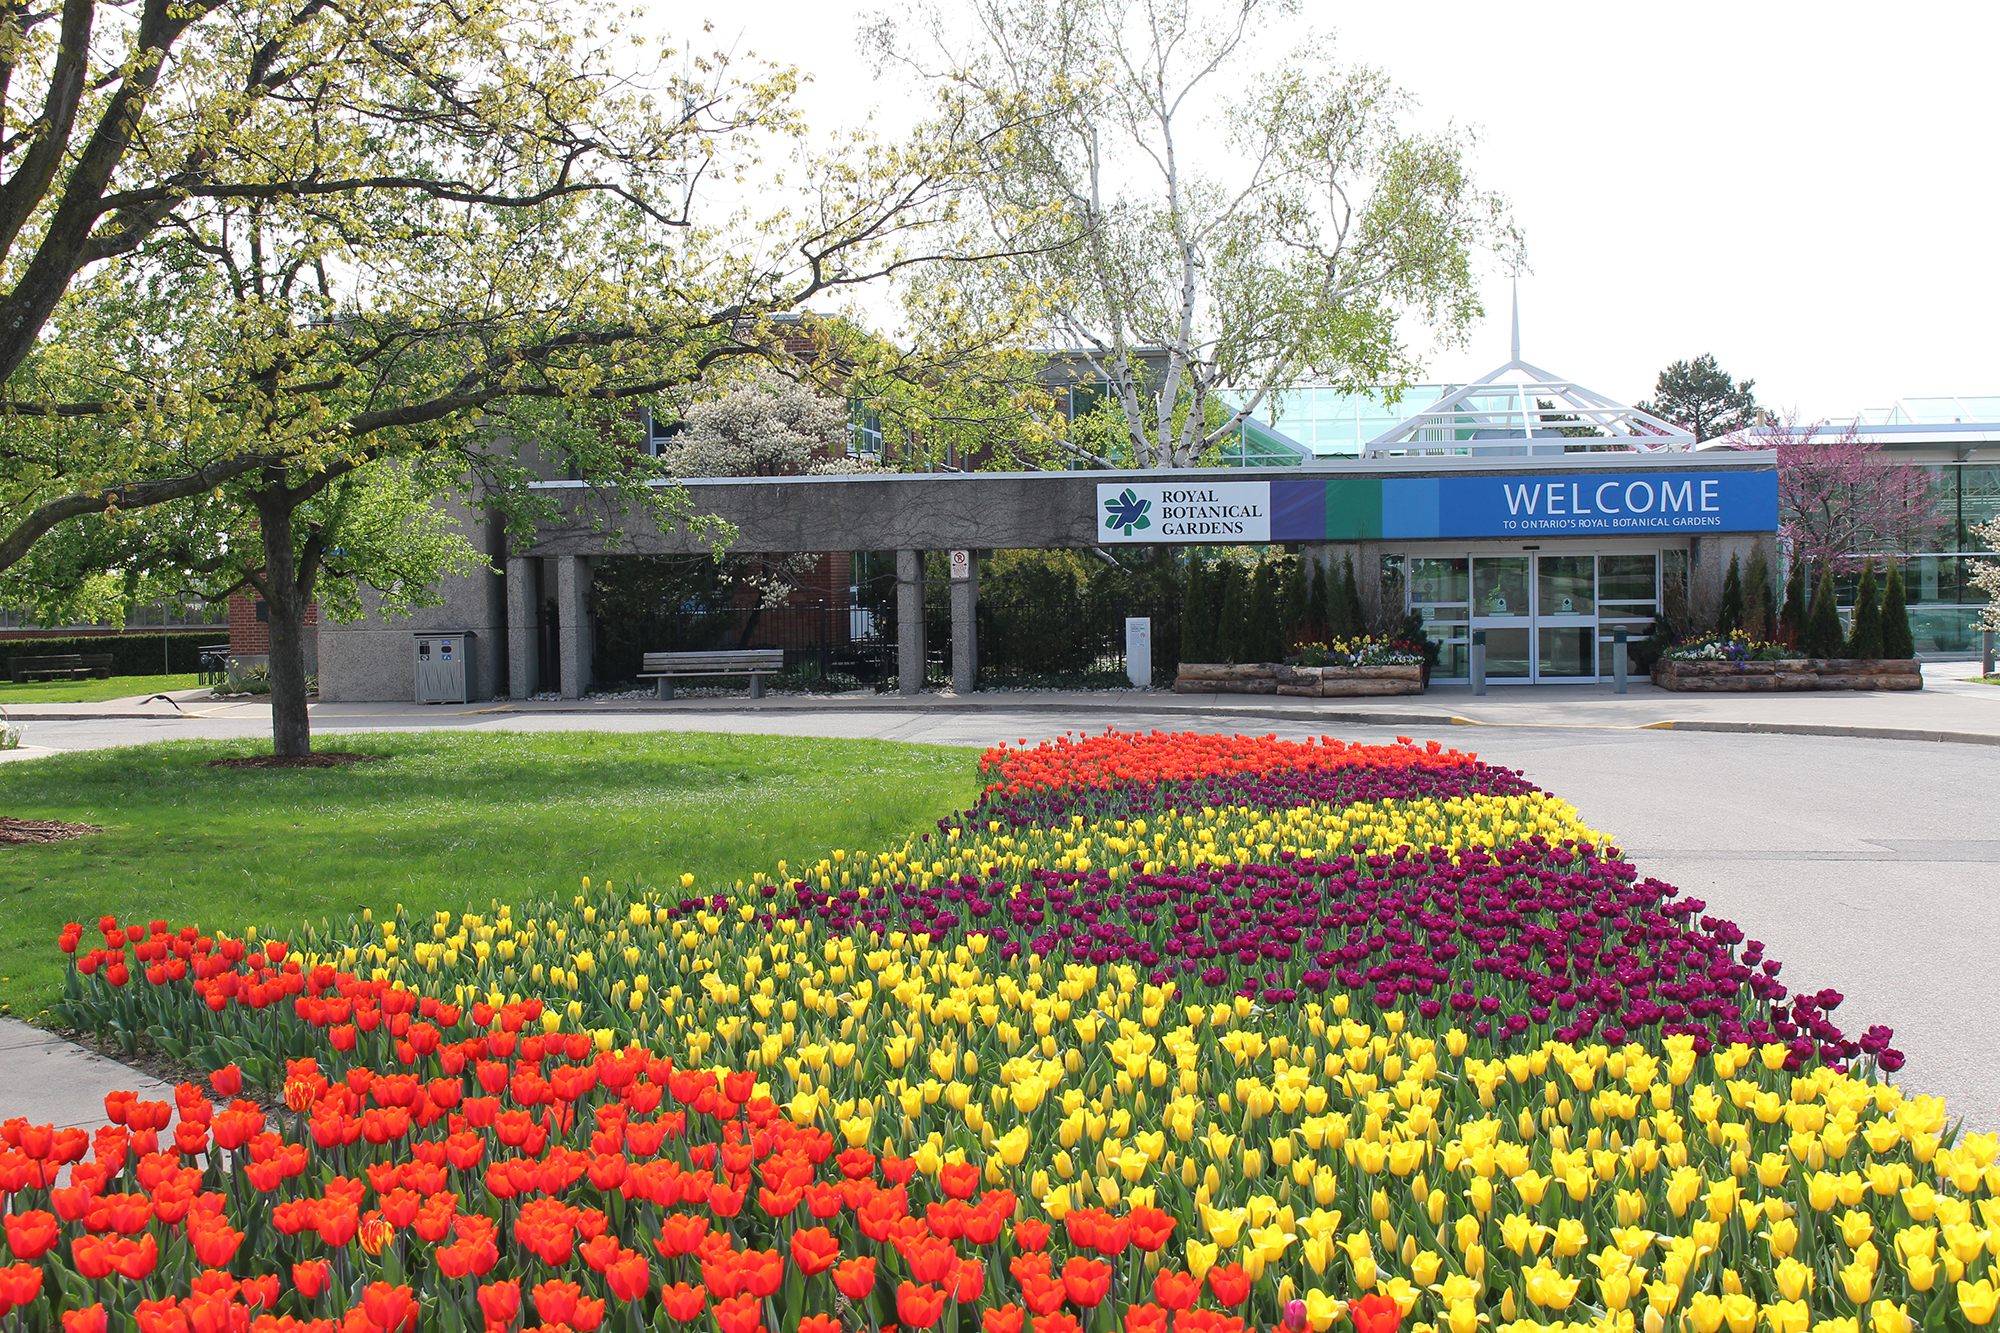 striped tulip display in front of rbg centre - Royal Botanical Gardens 680 Plains Road West Burlington On Canada